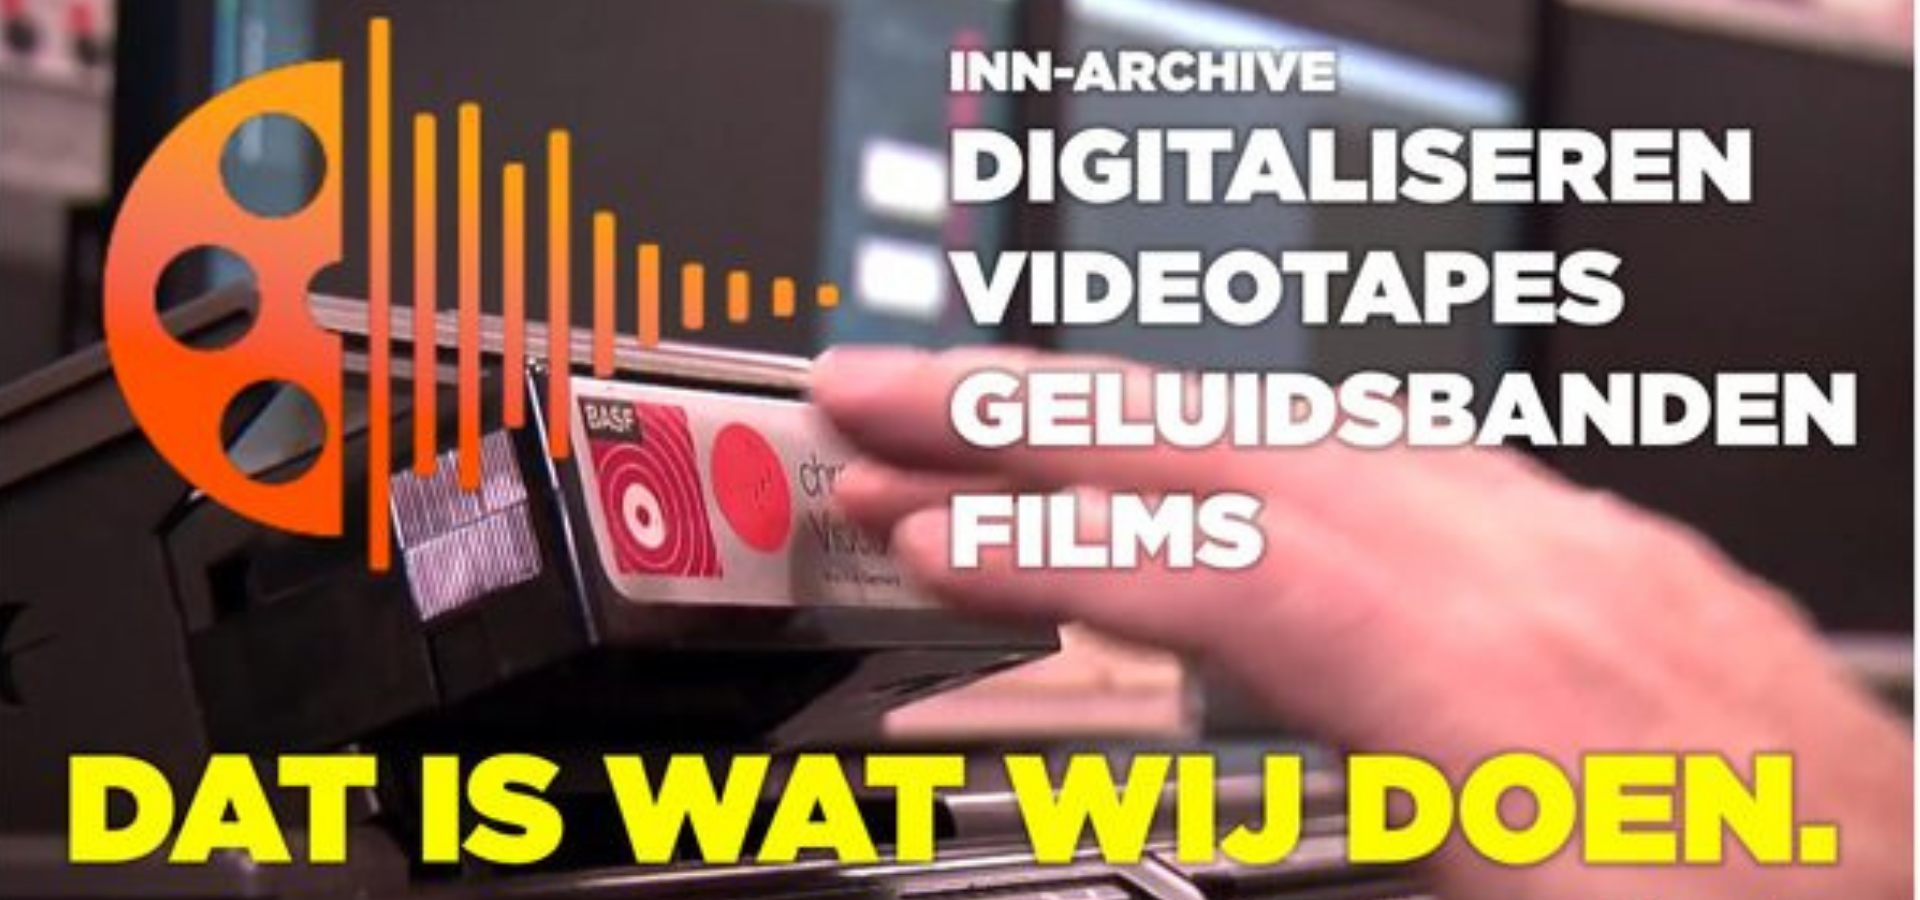 inn-archive | commercial - inn archive - inn-Archive | Commercial inn-archive - inn archive - Actueel – inn-Archive